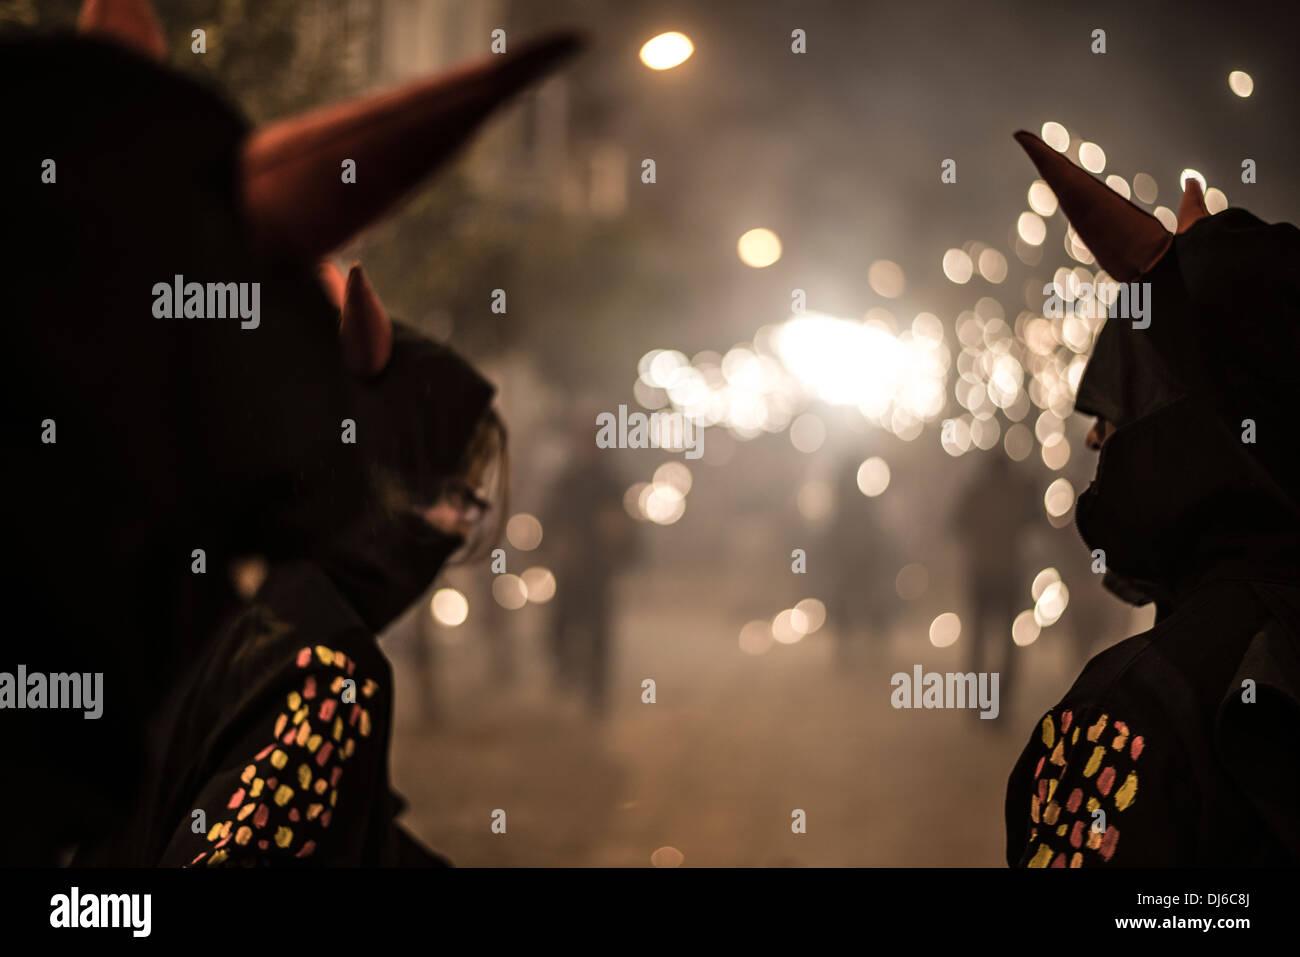 Europe, Spain., Barcelona, Poblenou, runfire, fireworks, explosive, party, popular festival, night, pyrotechnics,flare,sparkler - Stock Image